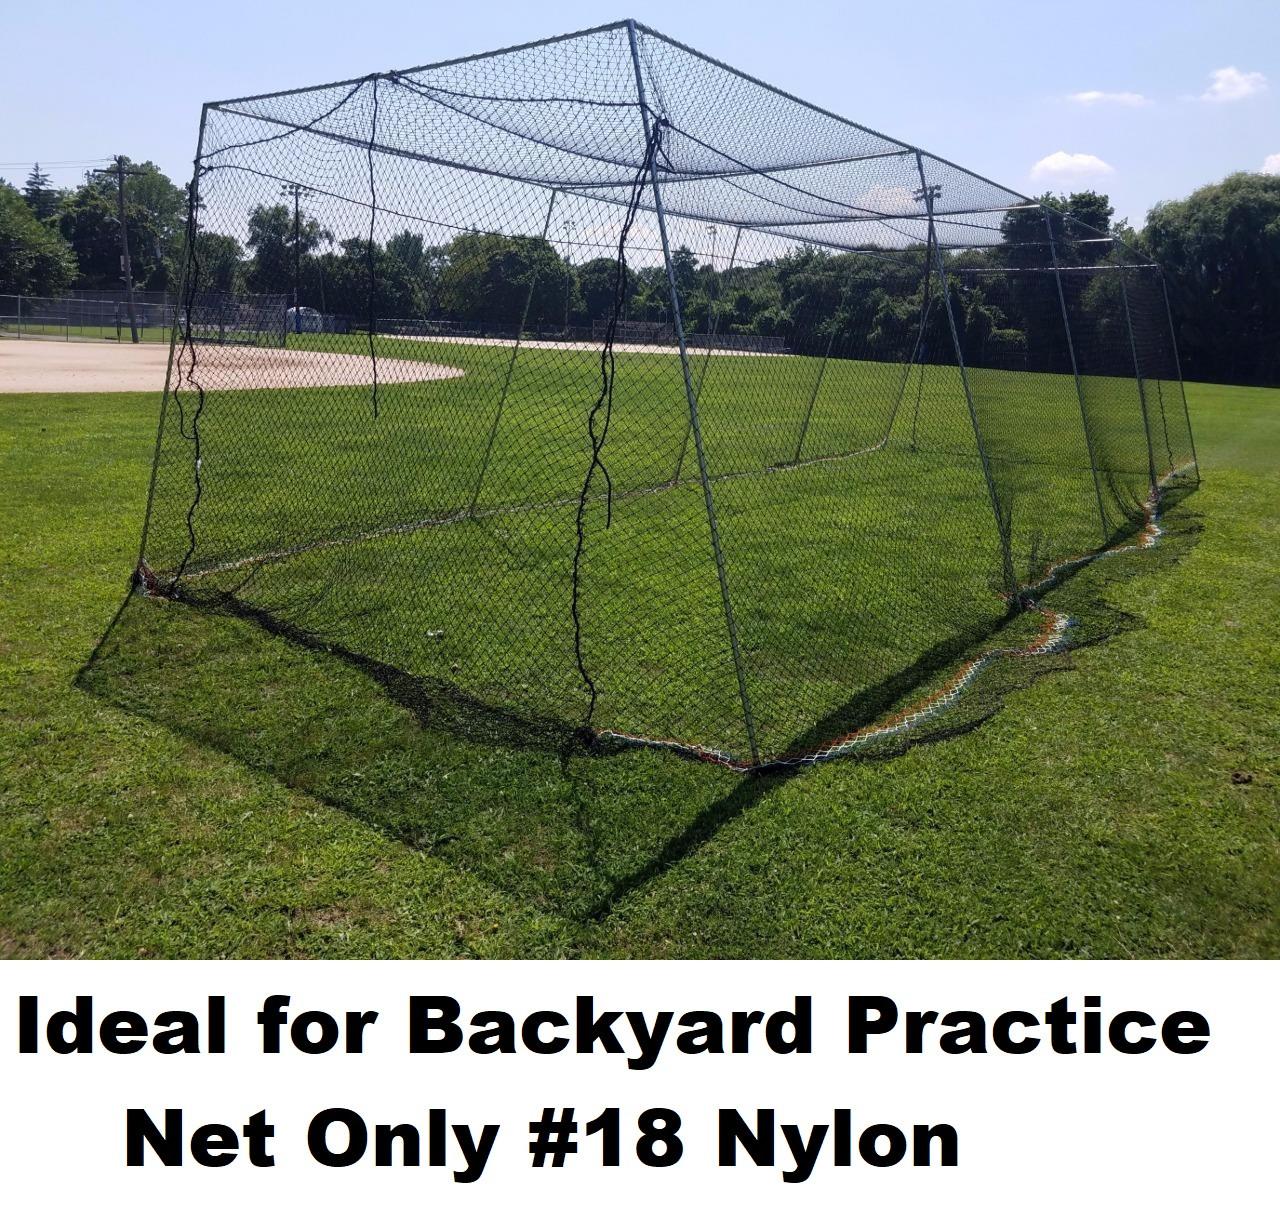 Backyard Baseball Batting Cage #18 Nylon Net Netting All ...